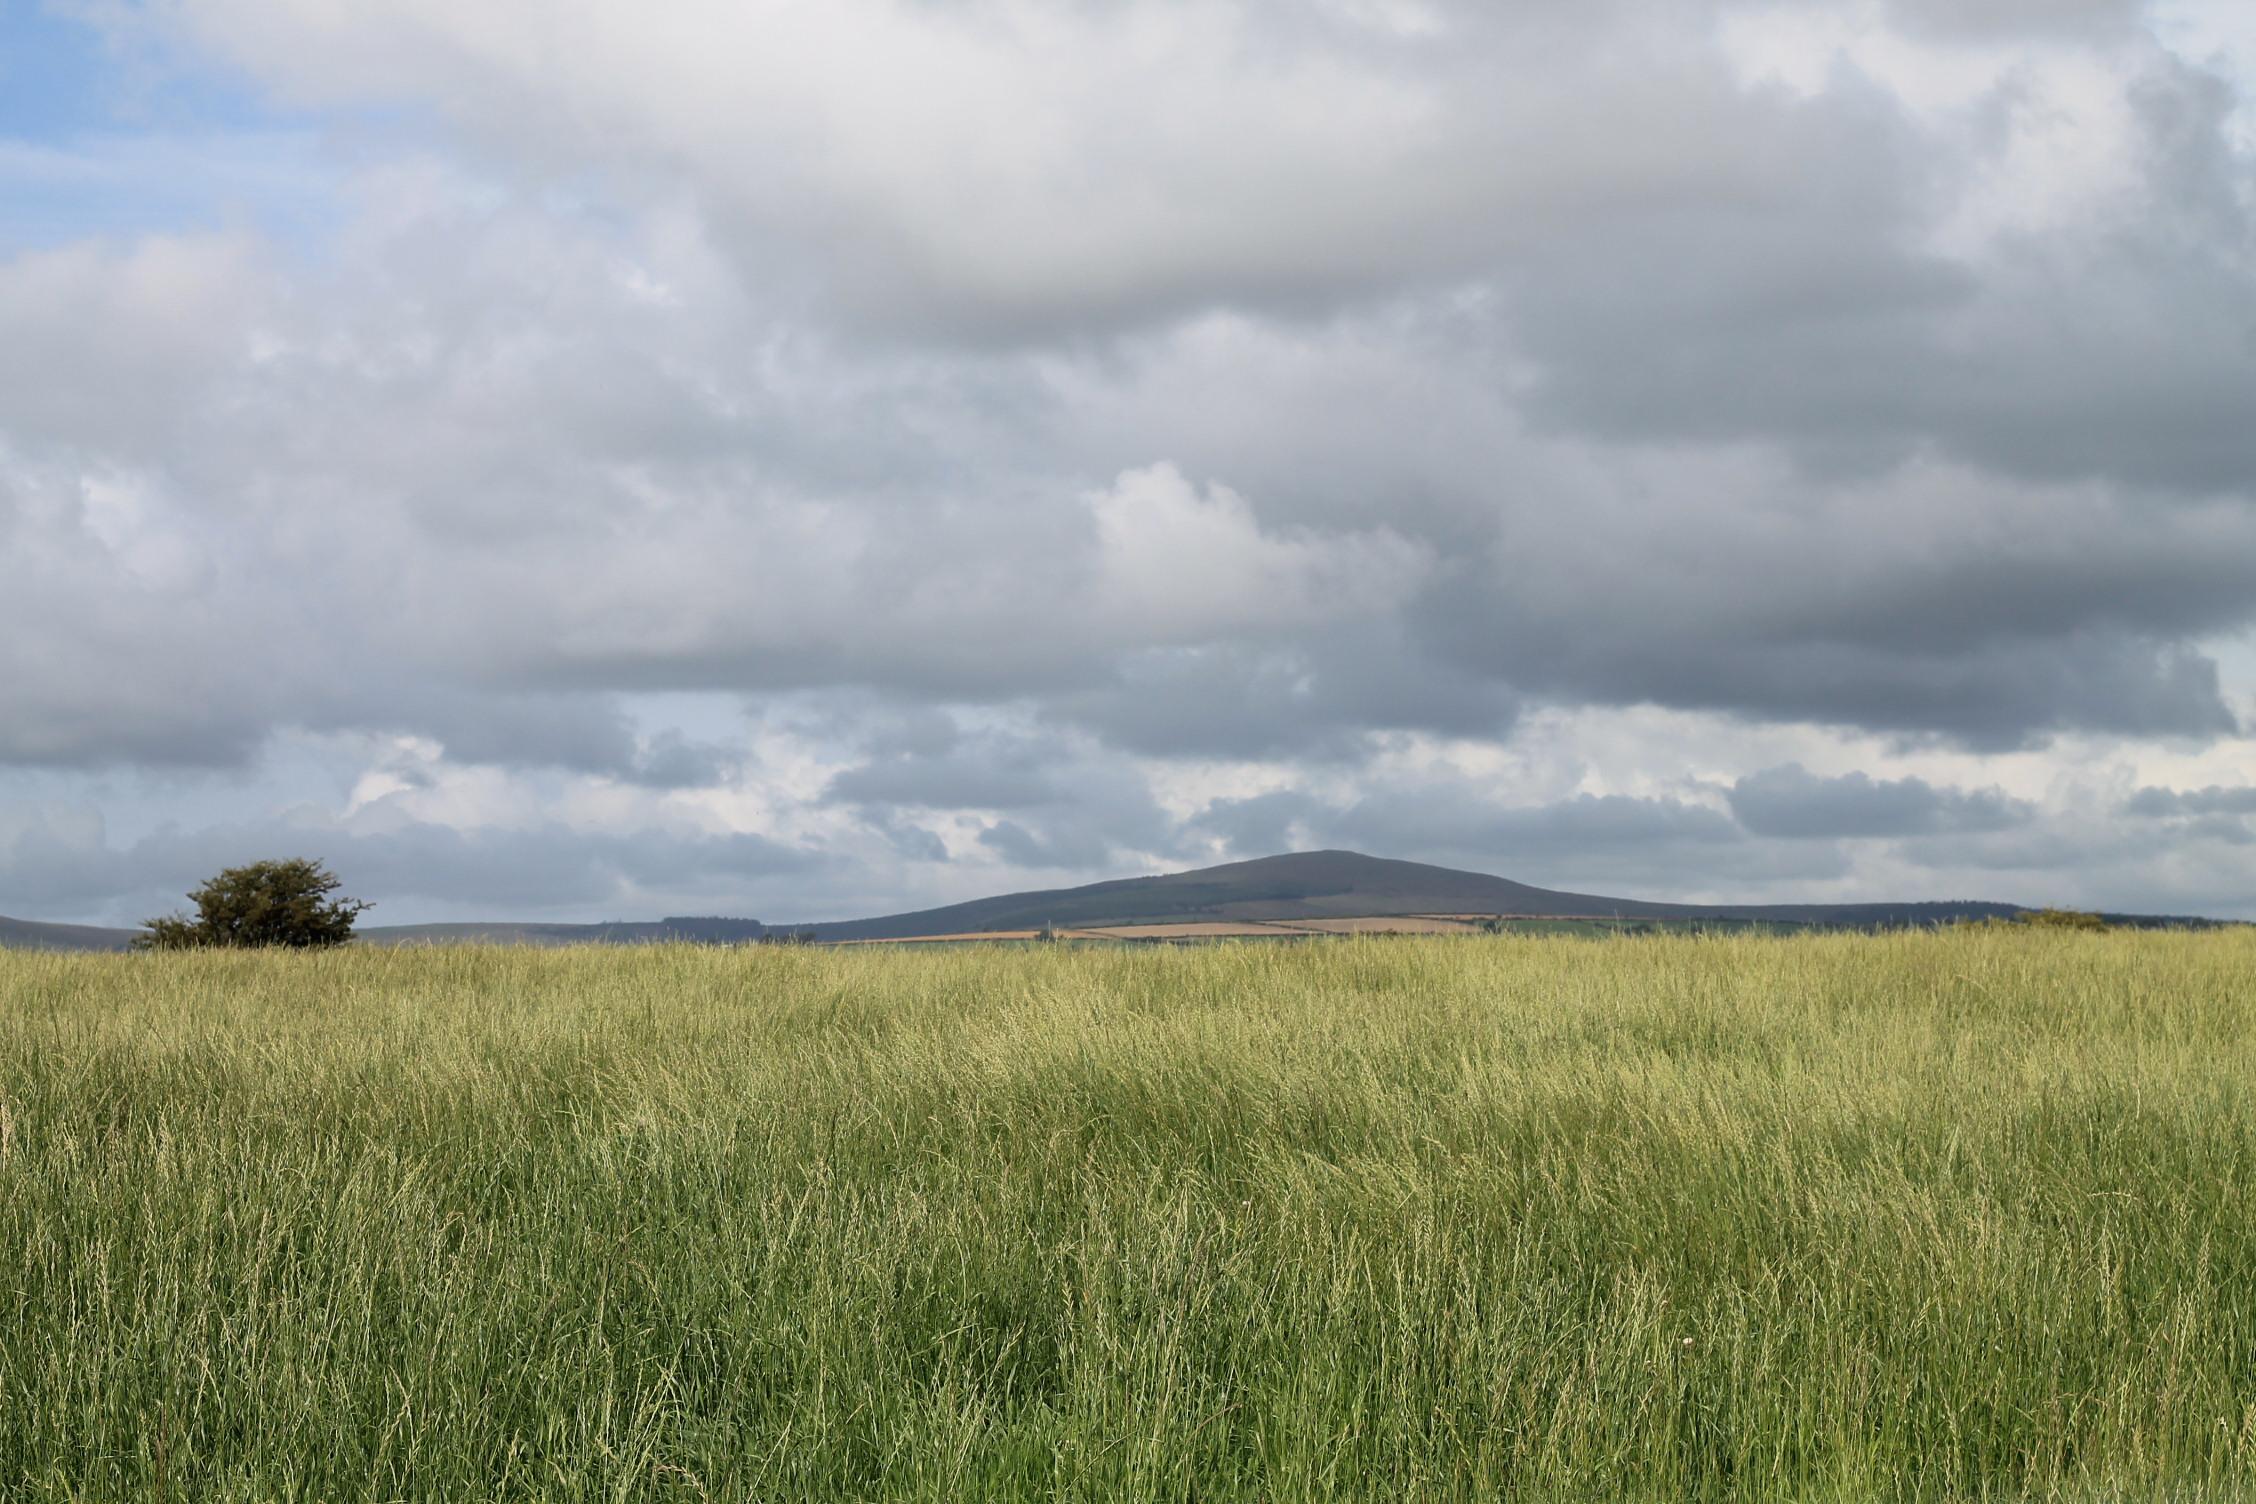 The Preseli Hills from Gelli.